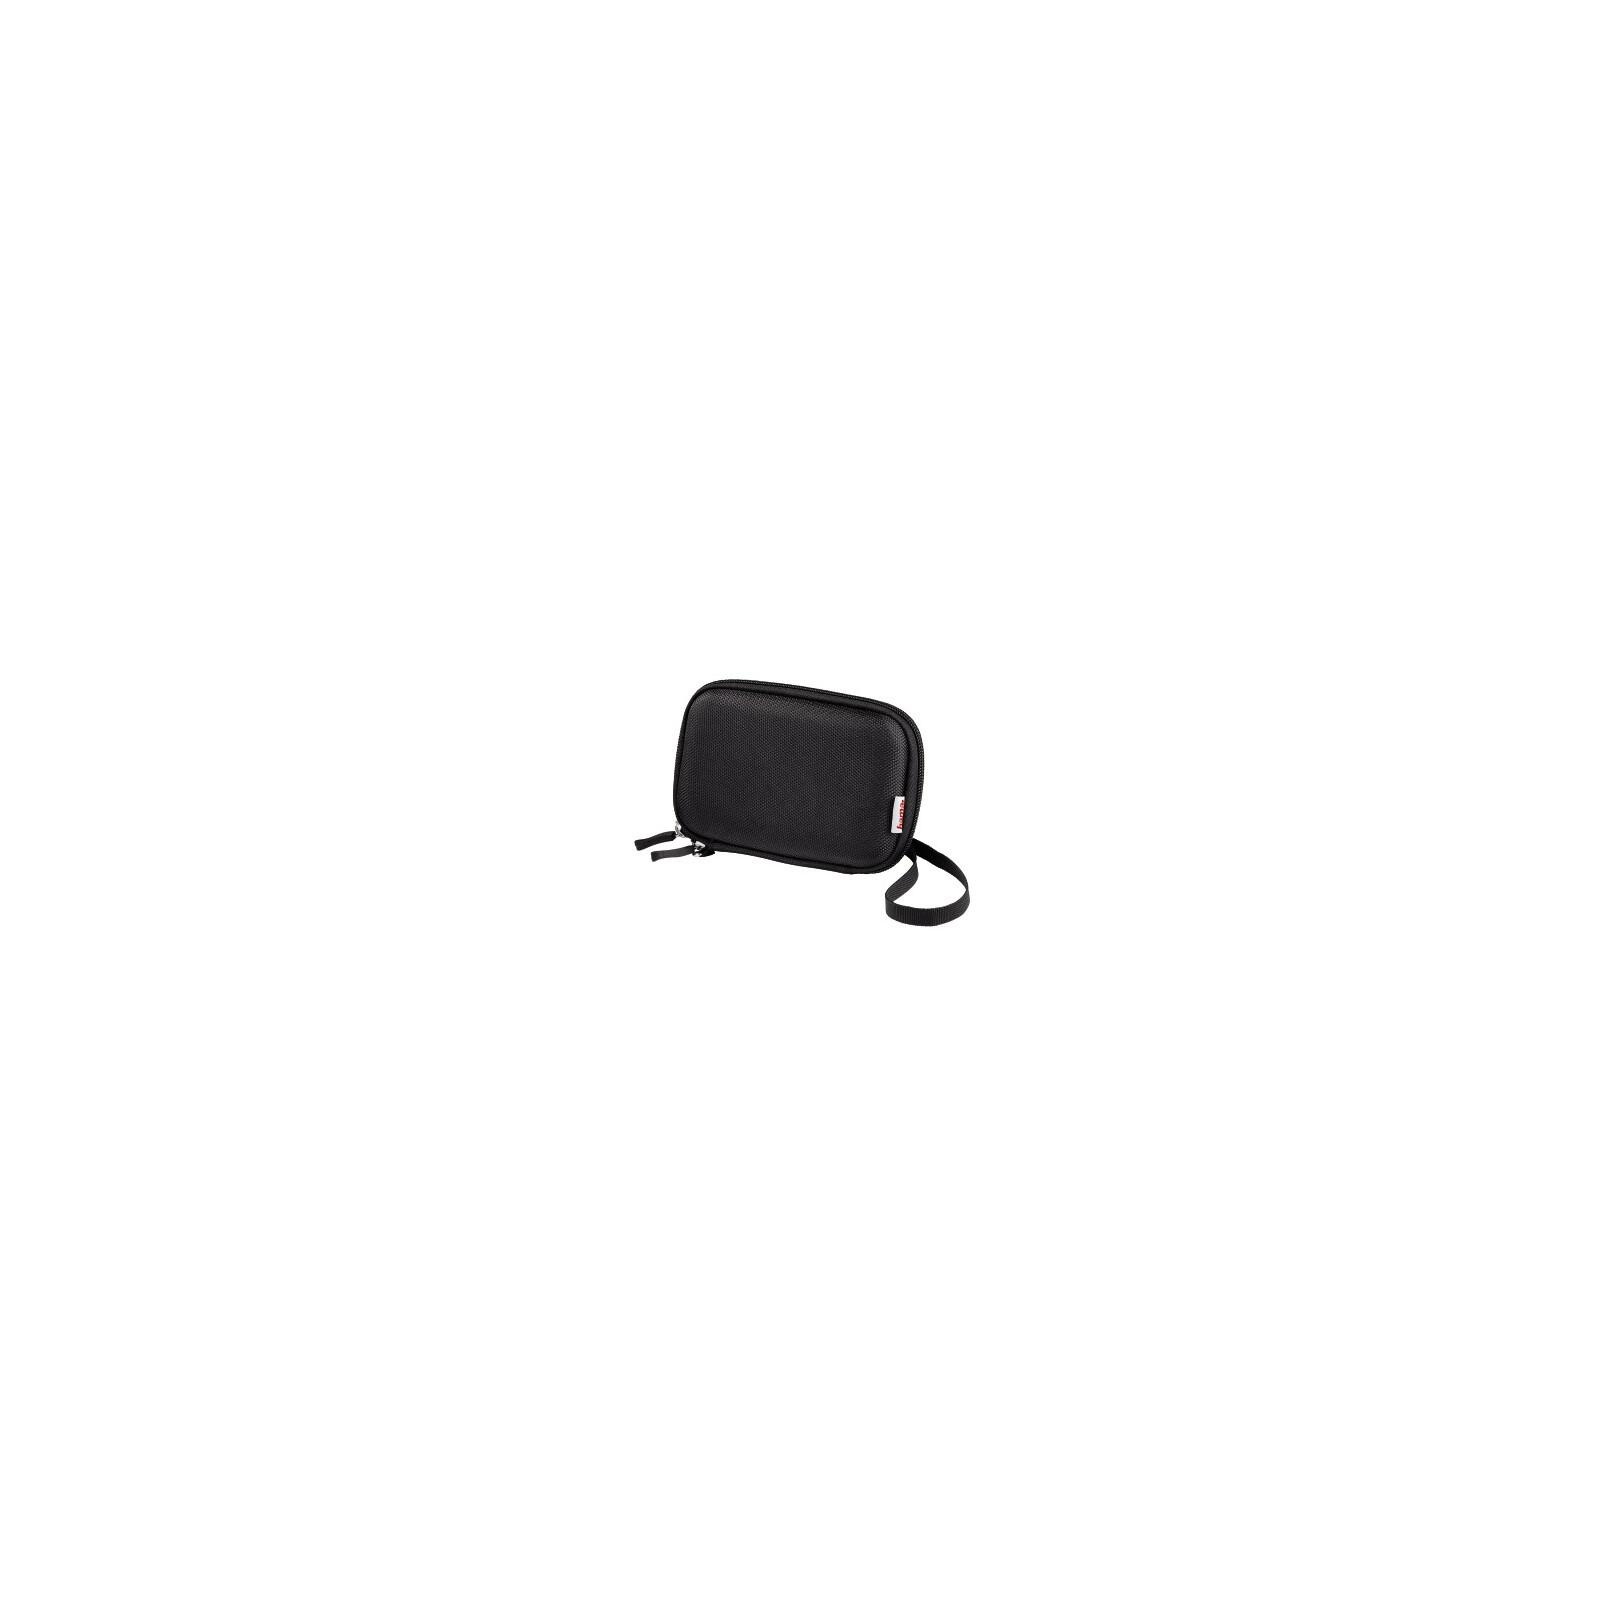 "Hama 95546 Festplattentasche E.V.A 2,5"" schwarz"